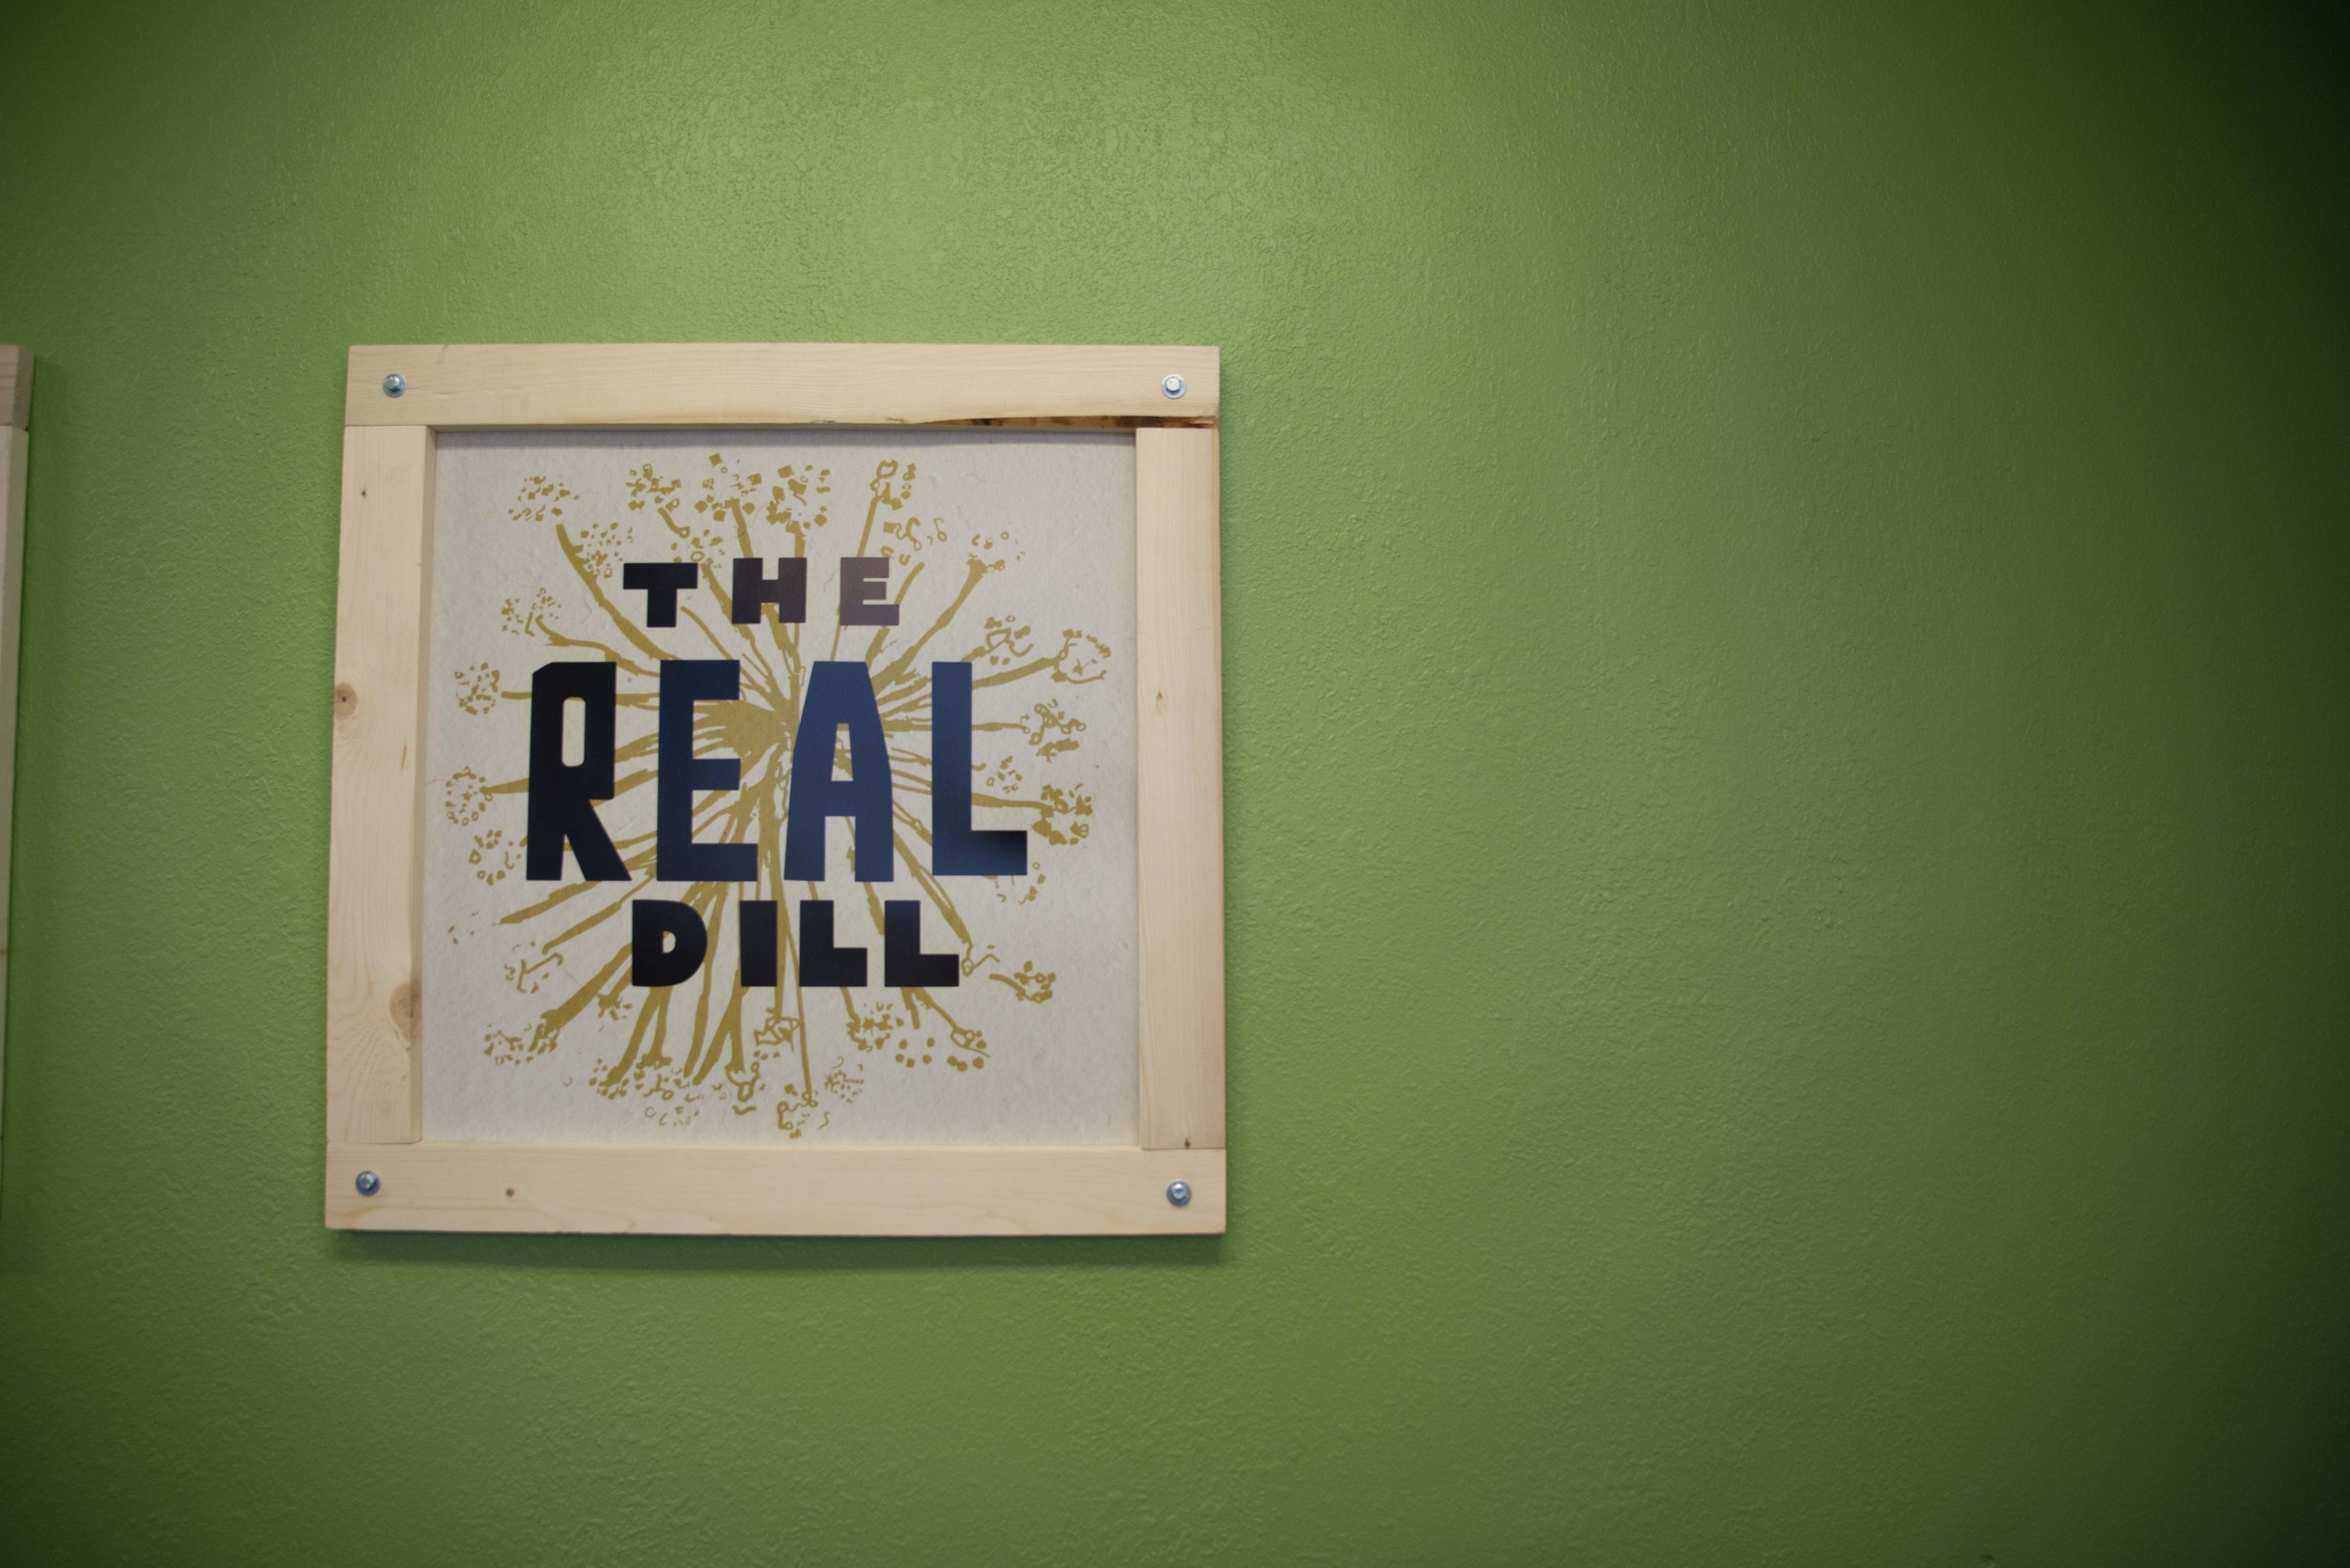 Real Dill websize-14.jpg